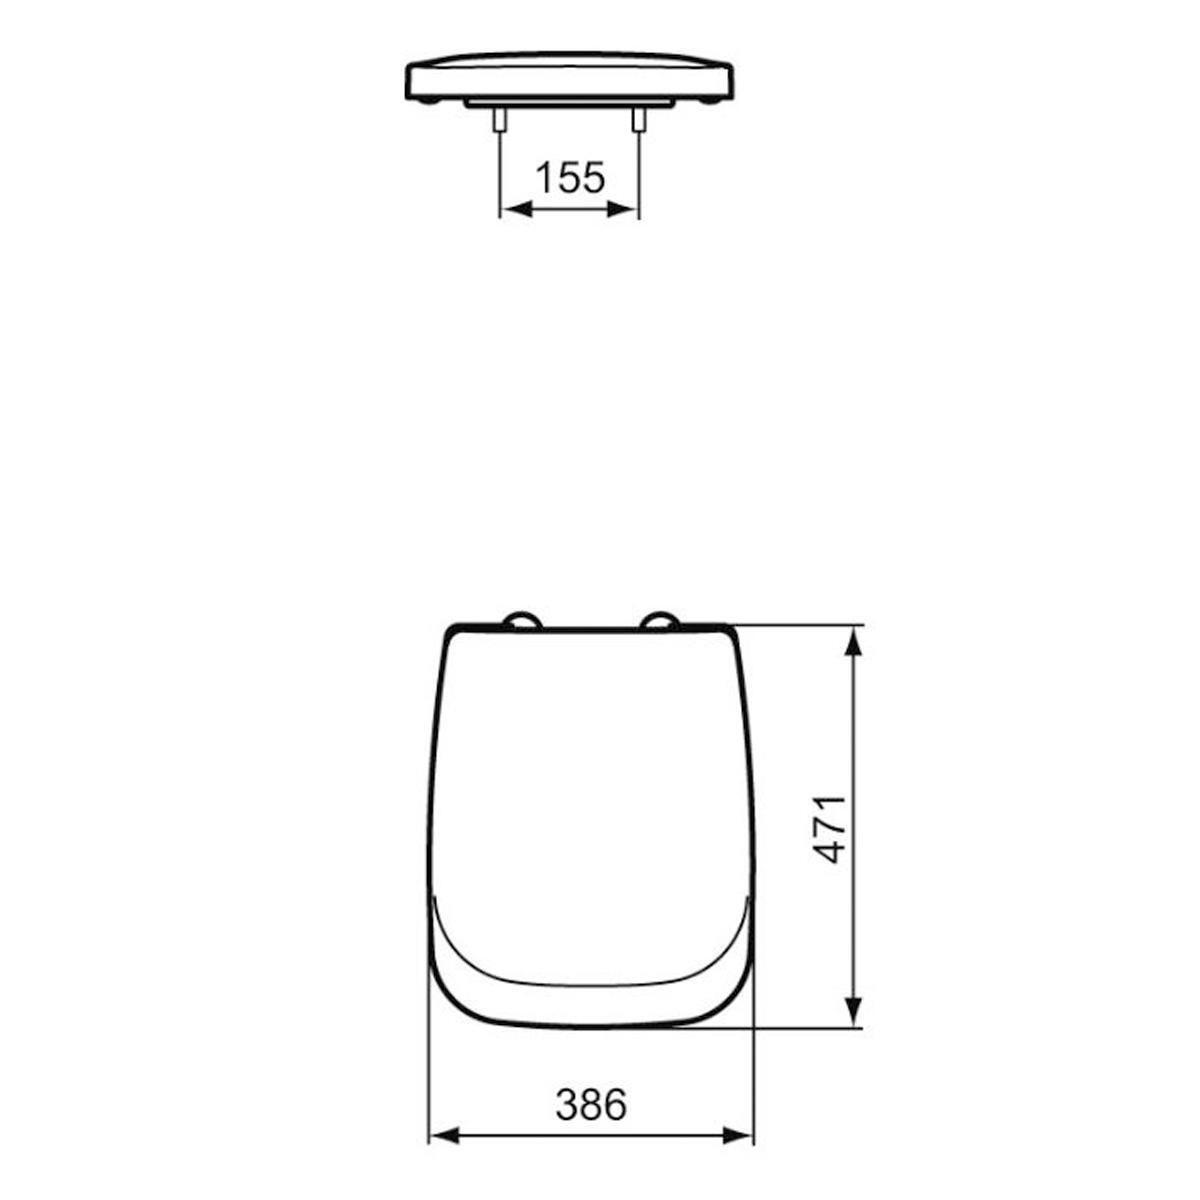 Copriwater rettangolare Originale per serie sanitari Tesi IDEAL STANDARD termoindurente bianco - 4